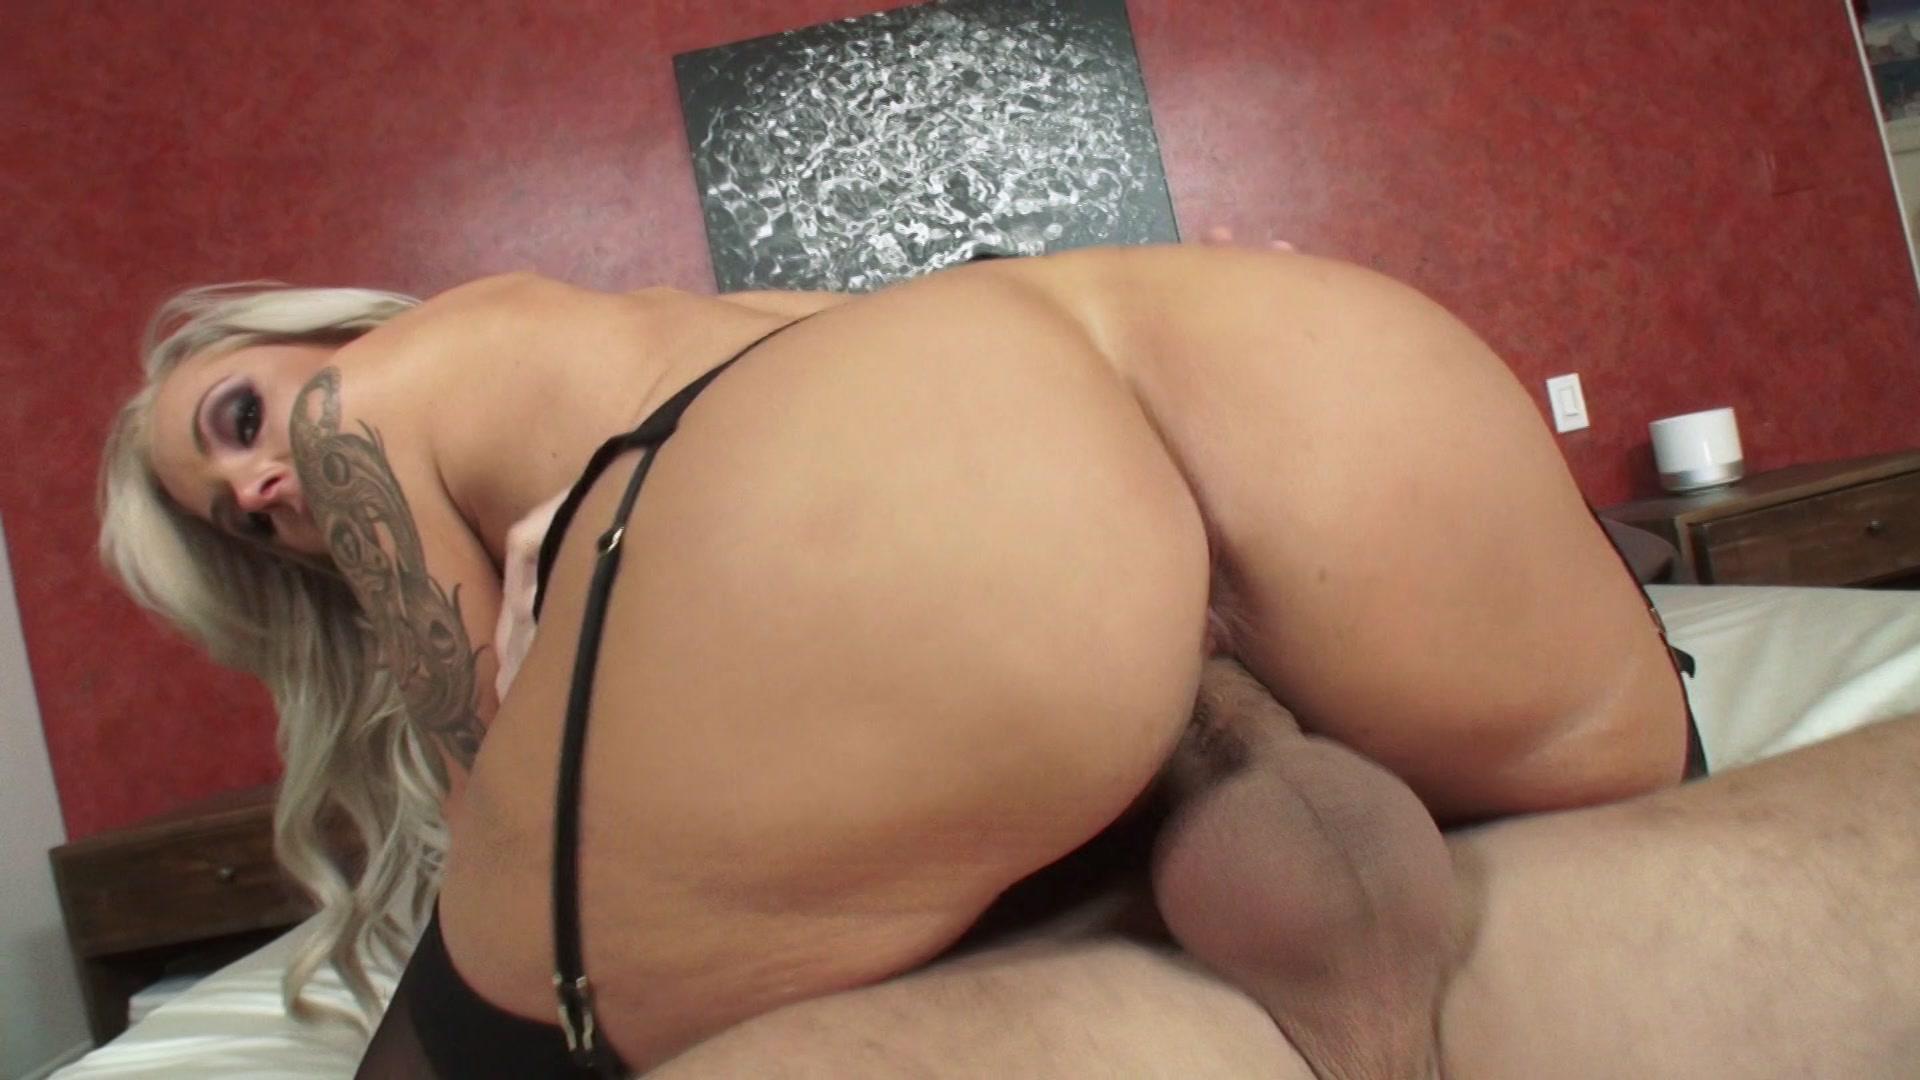 Big dildo pussy ass fistying